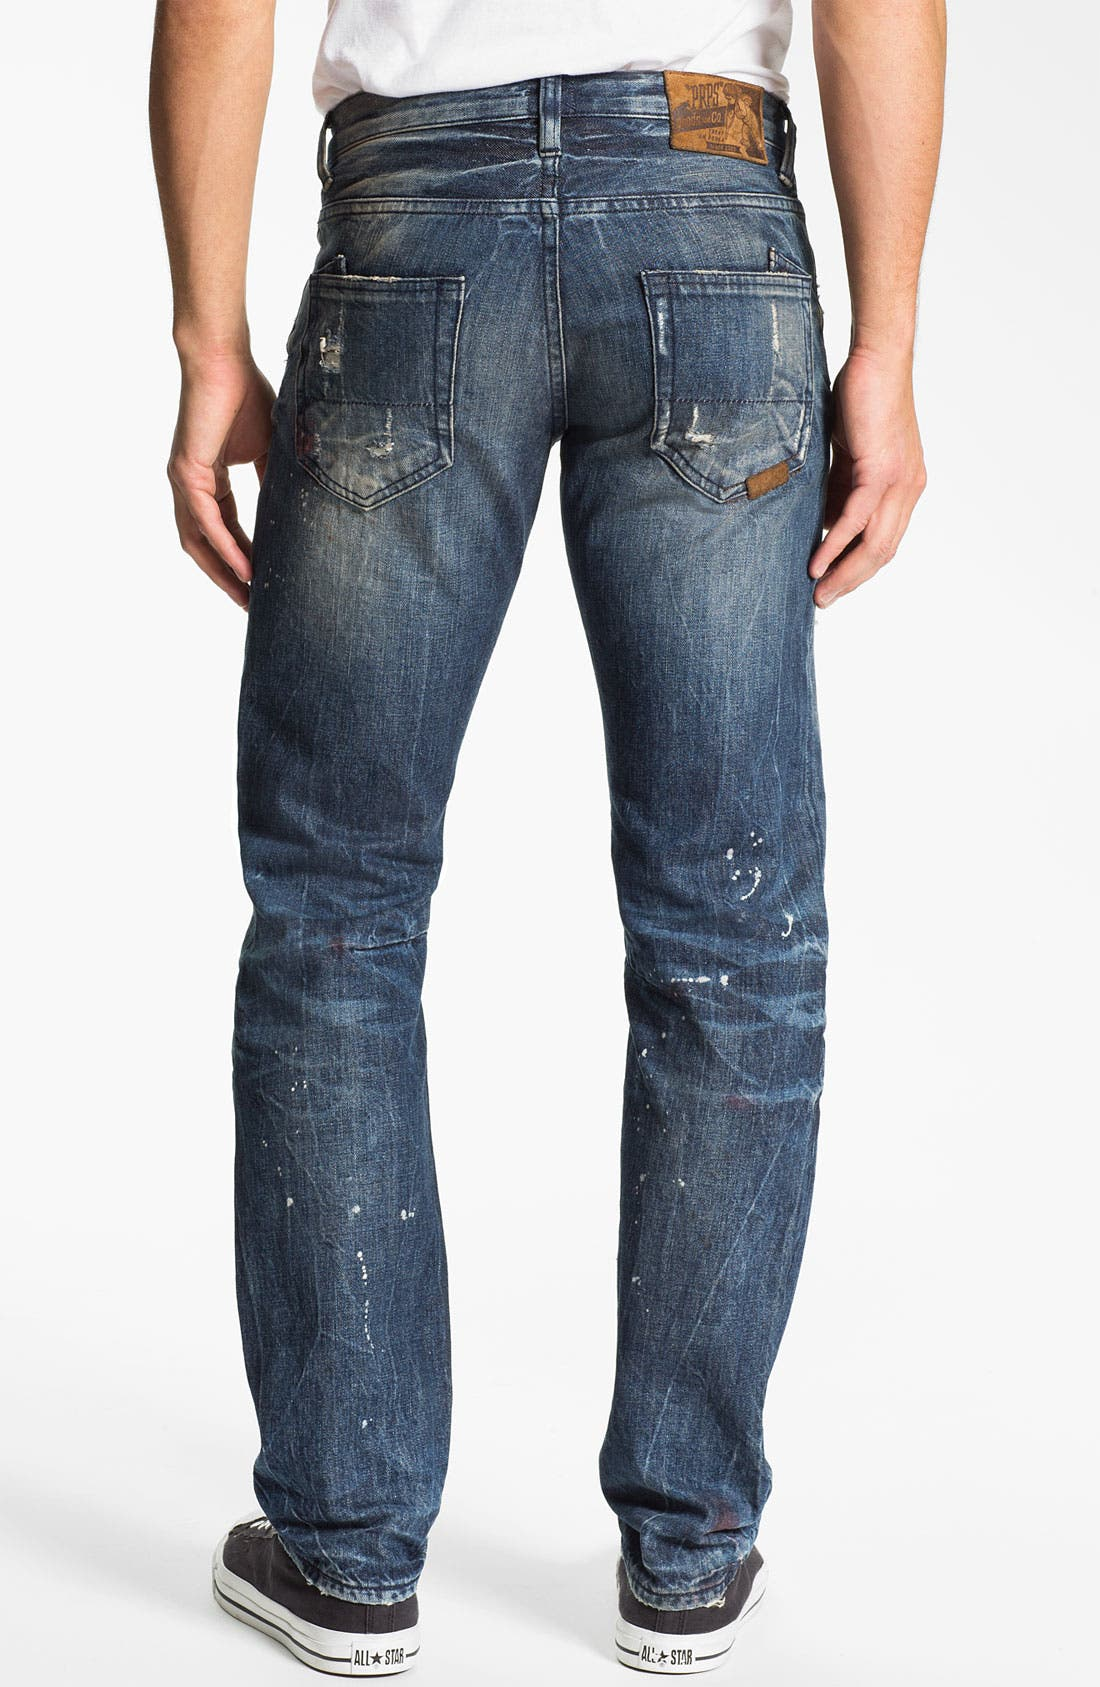 Alternate Image 1 Selected - PRPS 'Tibetan Ladder Rambler' Slim Straight Leg Jeans (Indigo)